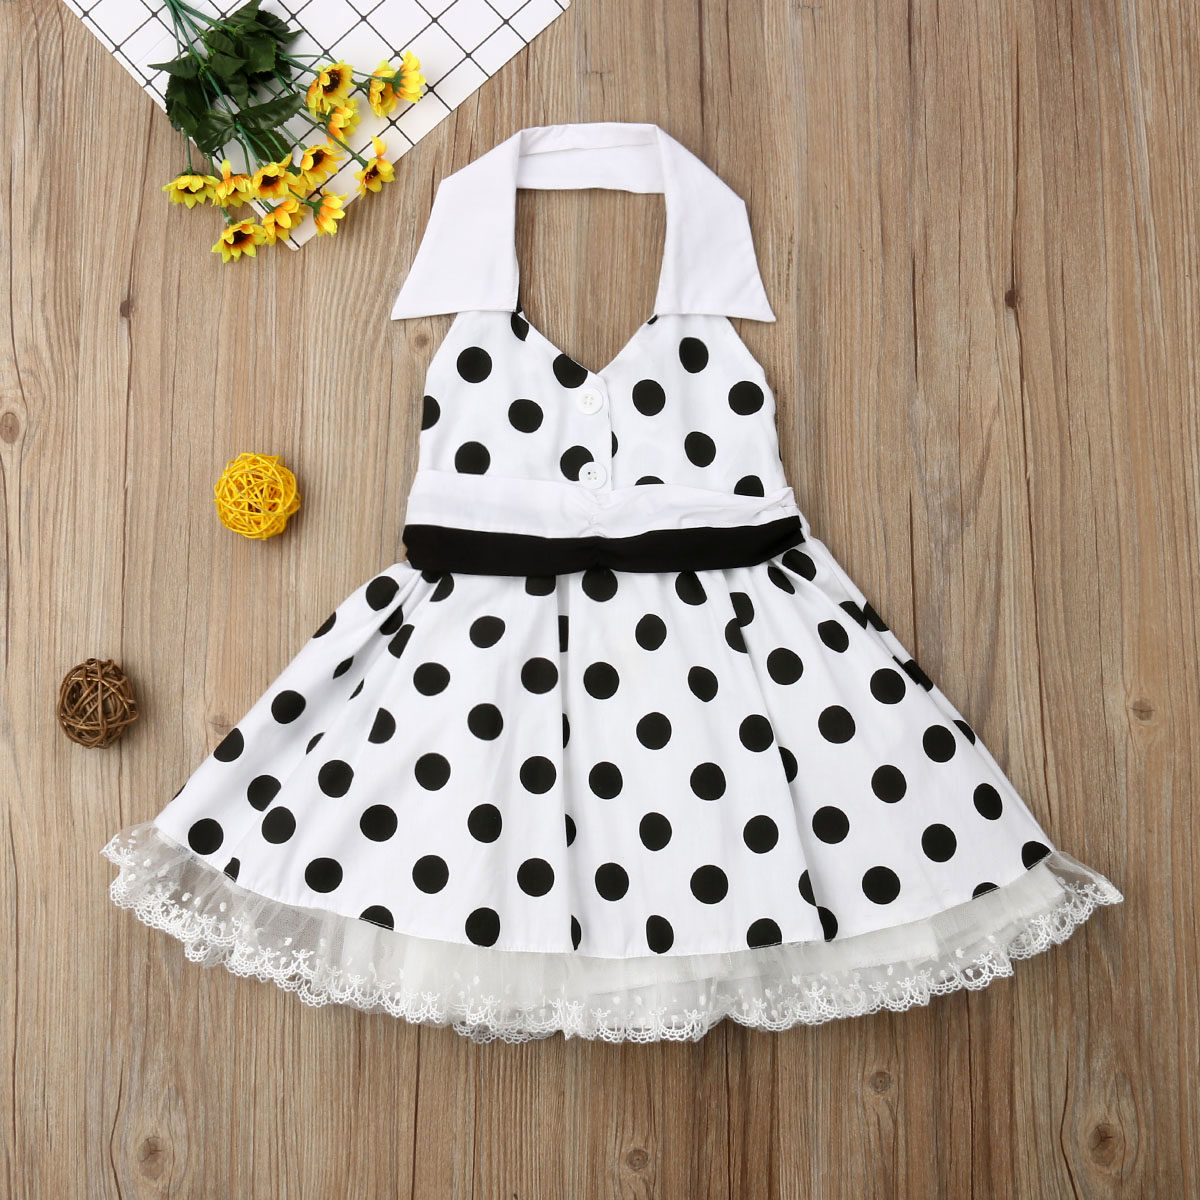 Summer Baby Girls Polka Dot Dress Clothes Halter Ruffle Tutu Princess Dresses US